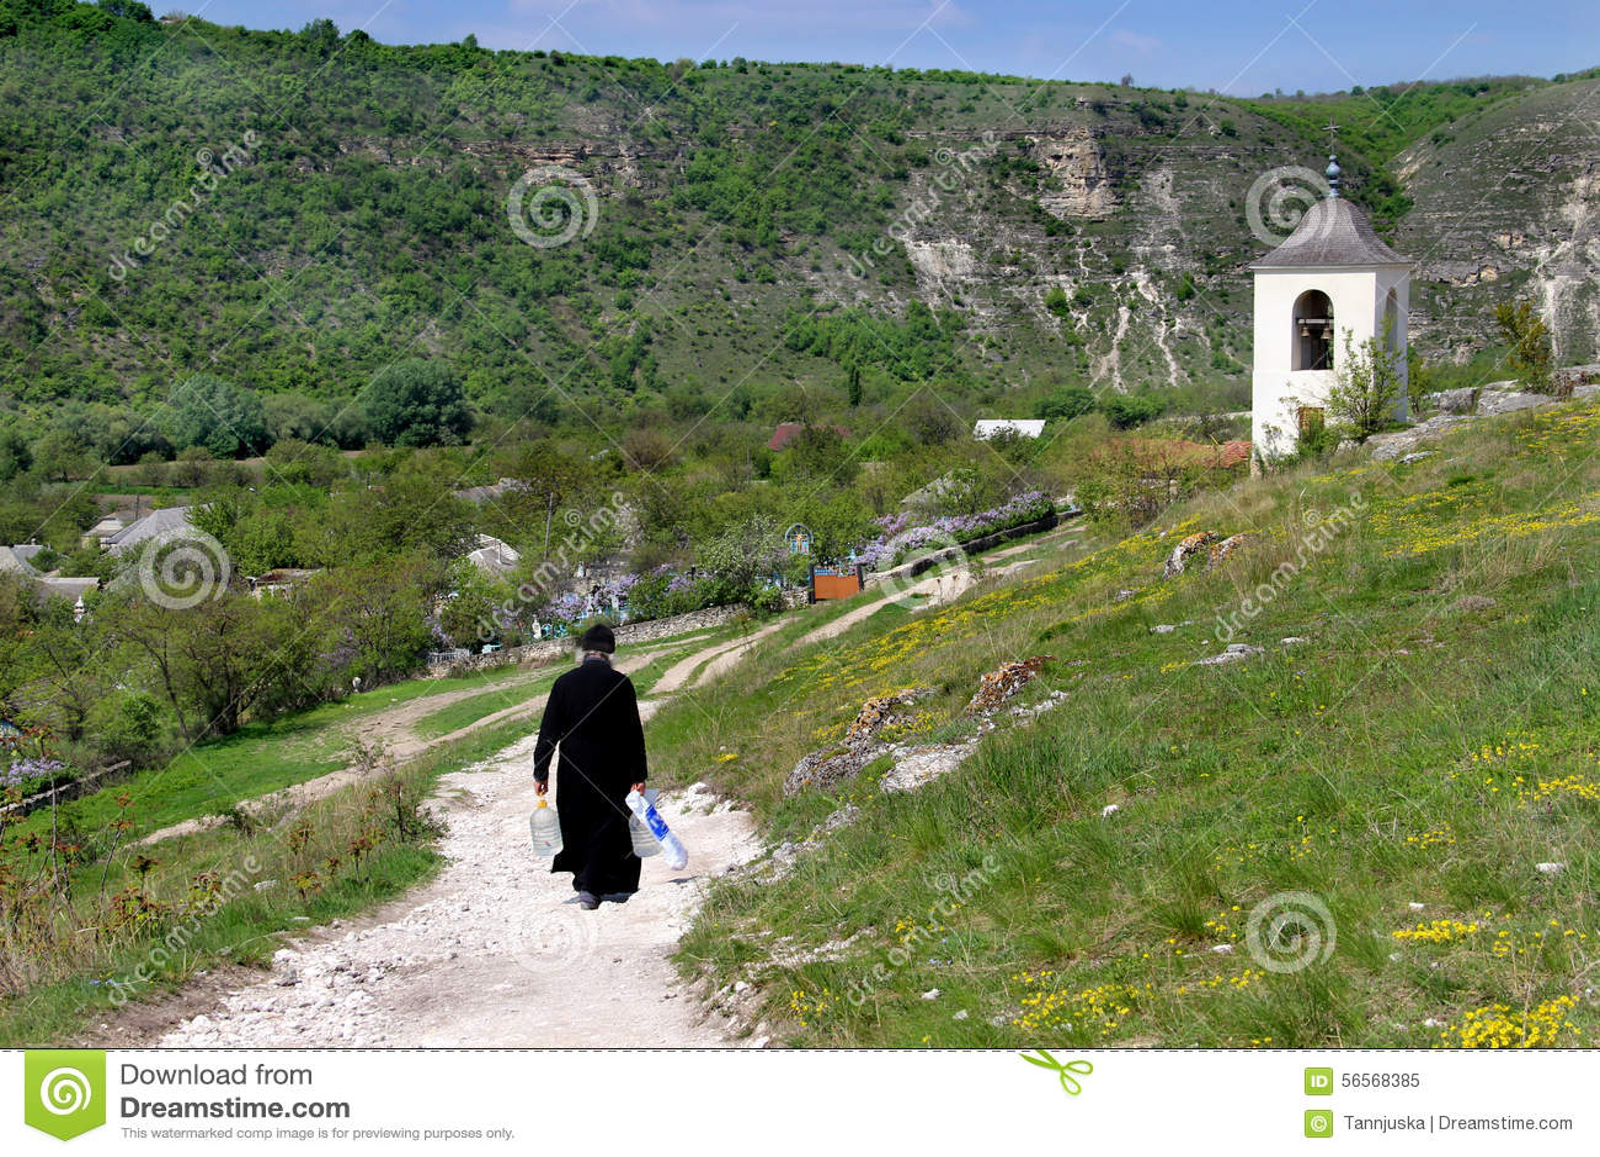 Download Μοναστήρι σπηλιών στη Μολδαβία, Orheiul Vechi Στοκ Εικόνα - εικόνα από οικολογία, χωριό: 56568385